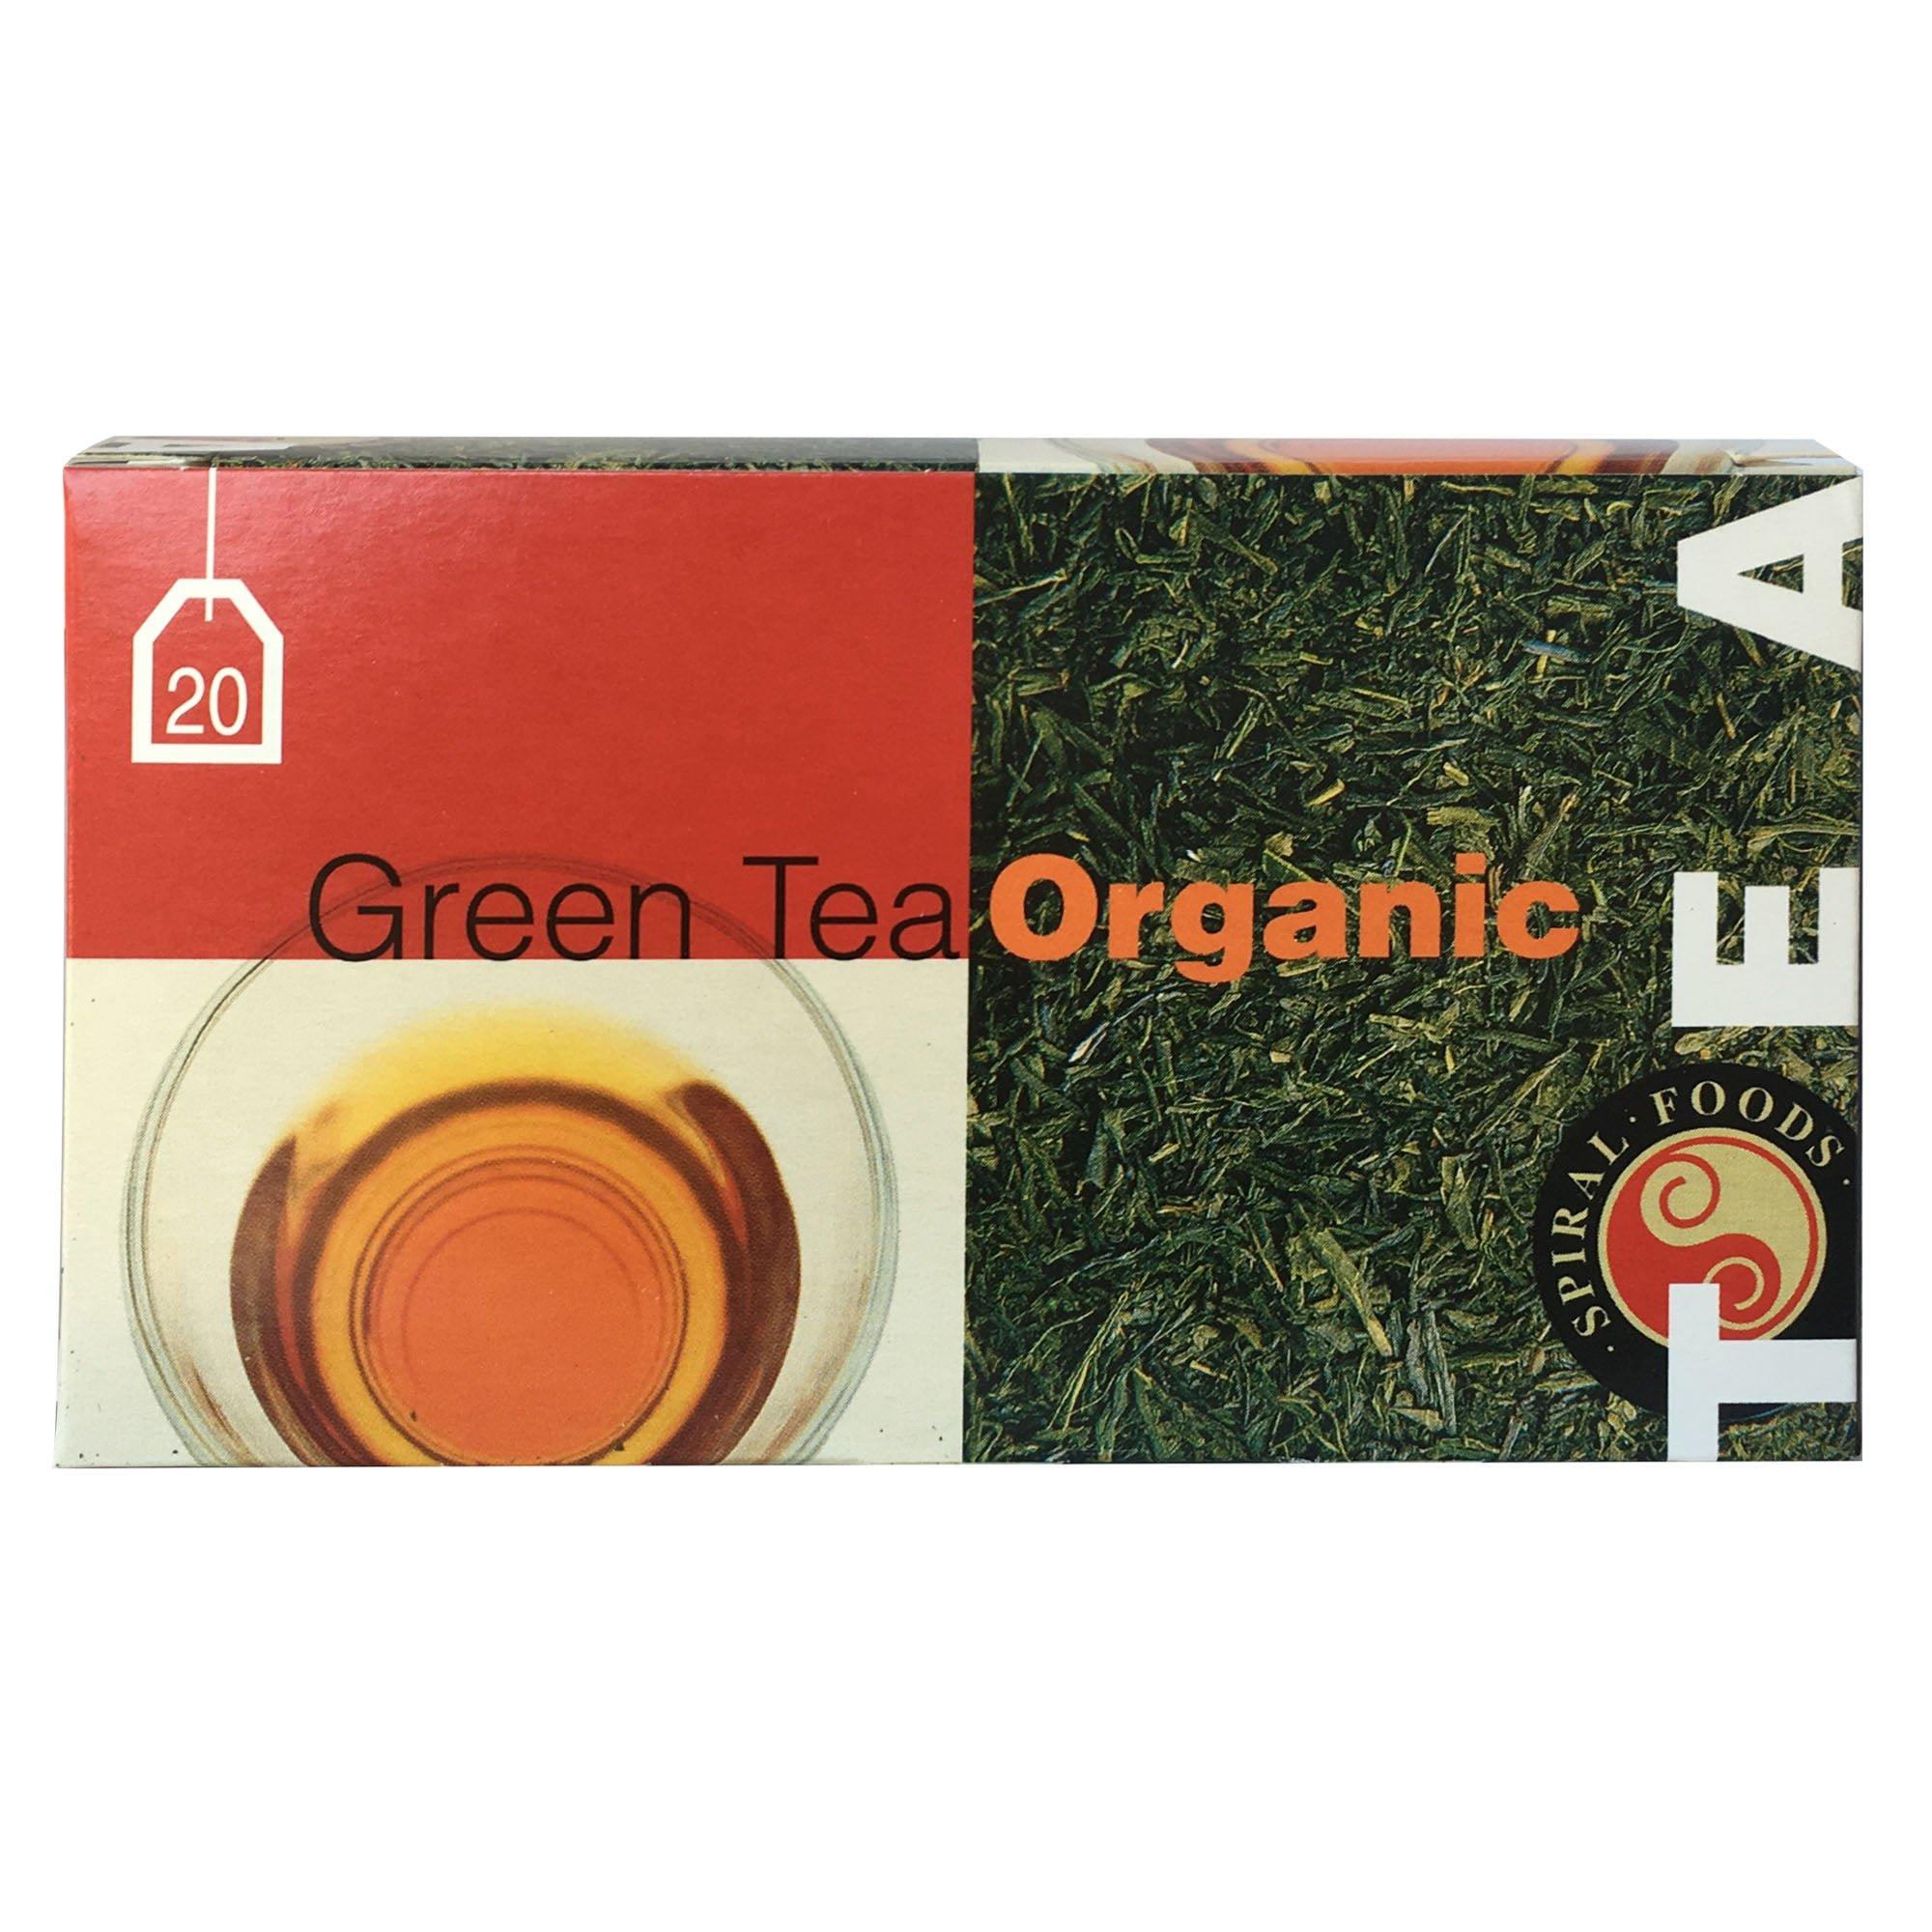 greentea-teabags